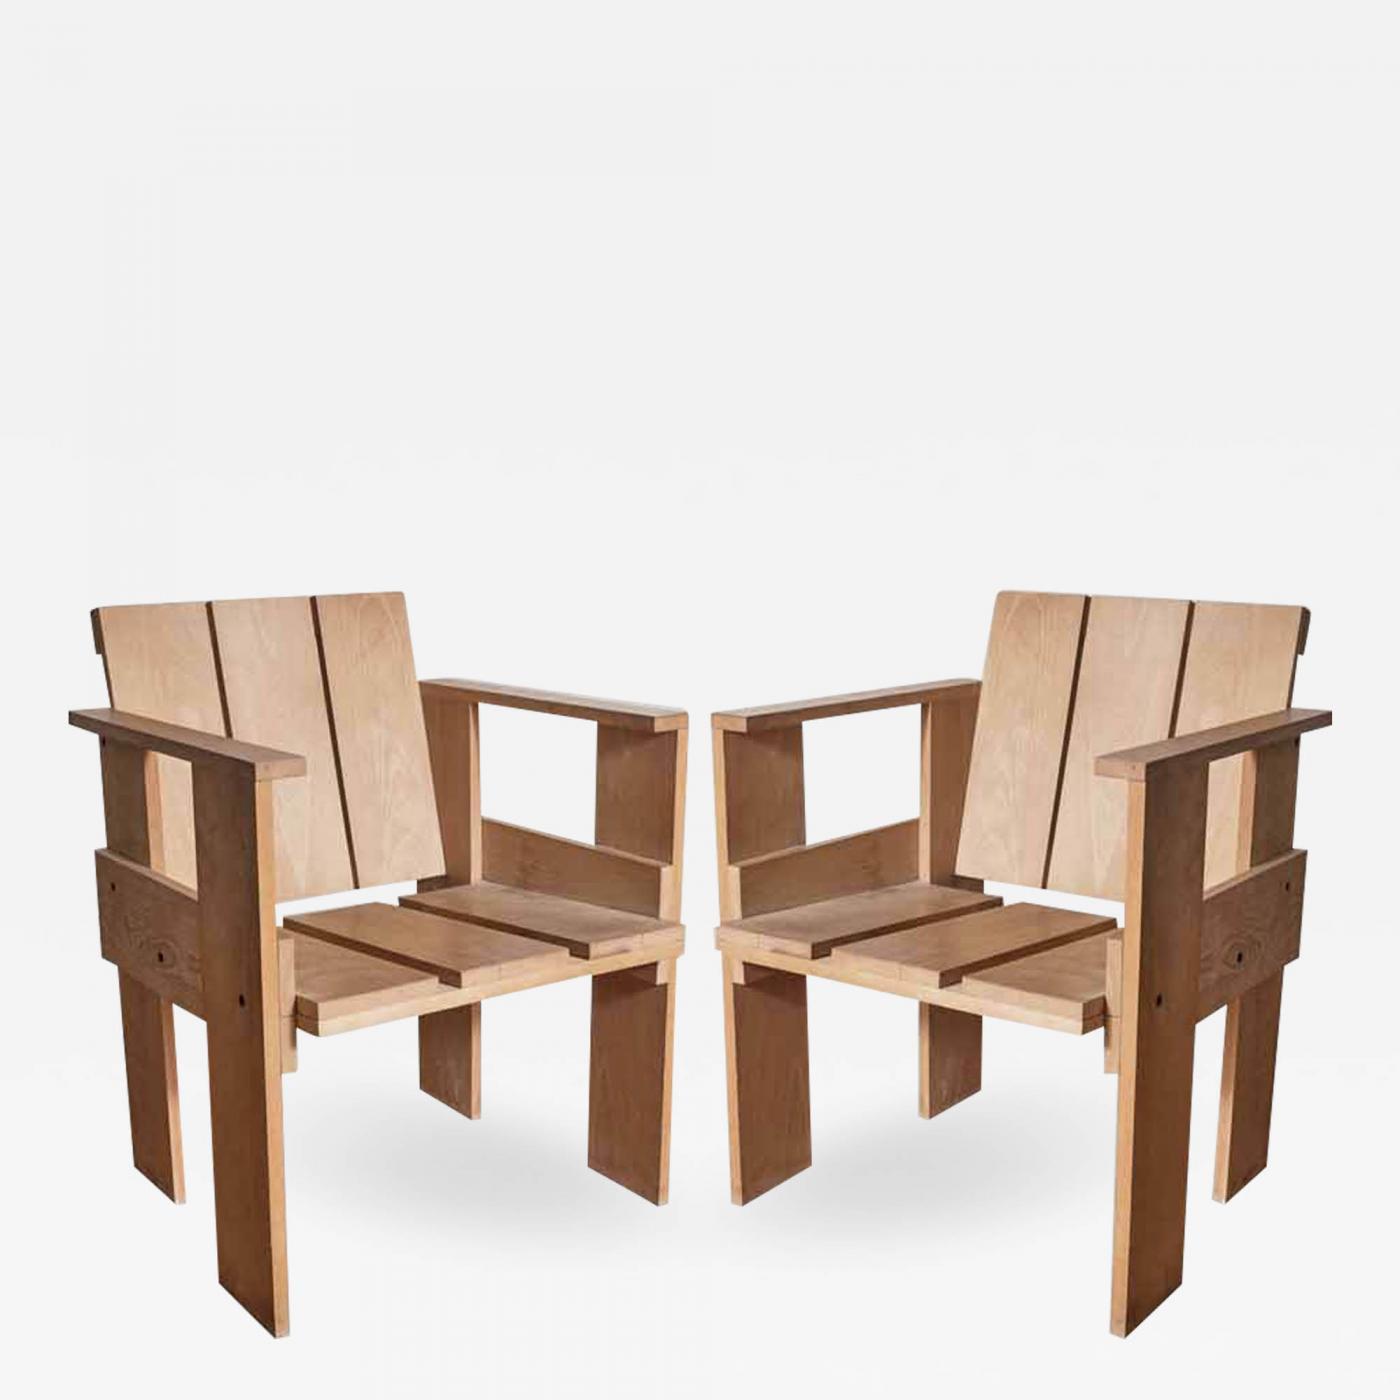 Marvelous Gerrit Rietveld Pair Gerrit Rietveld Crate Chairs Cassina Stamped Italy 1970 Download Free Architecture Designs Scobabritishbridgeorg